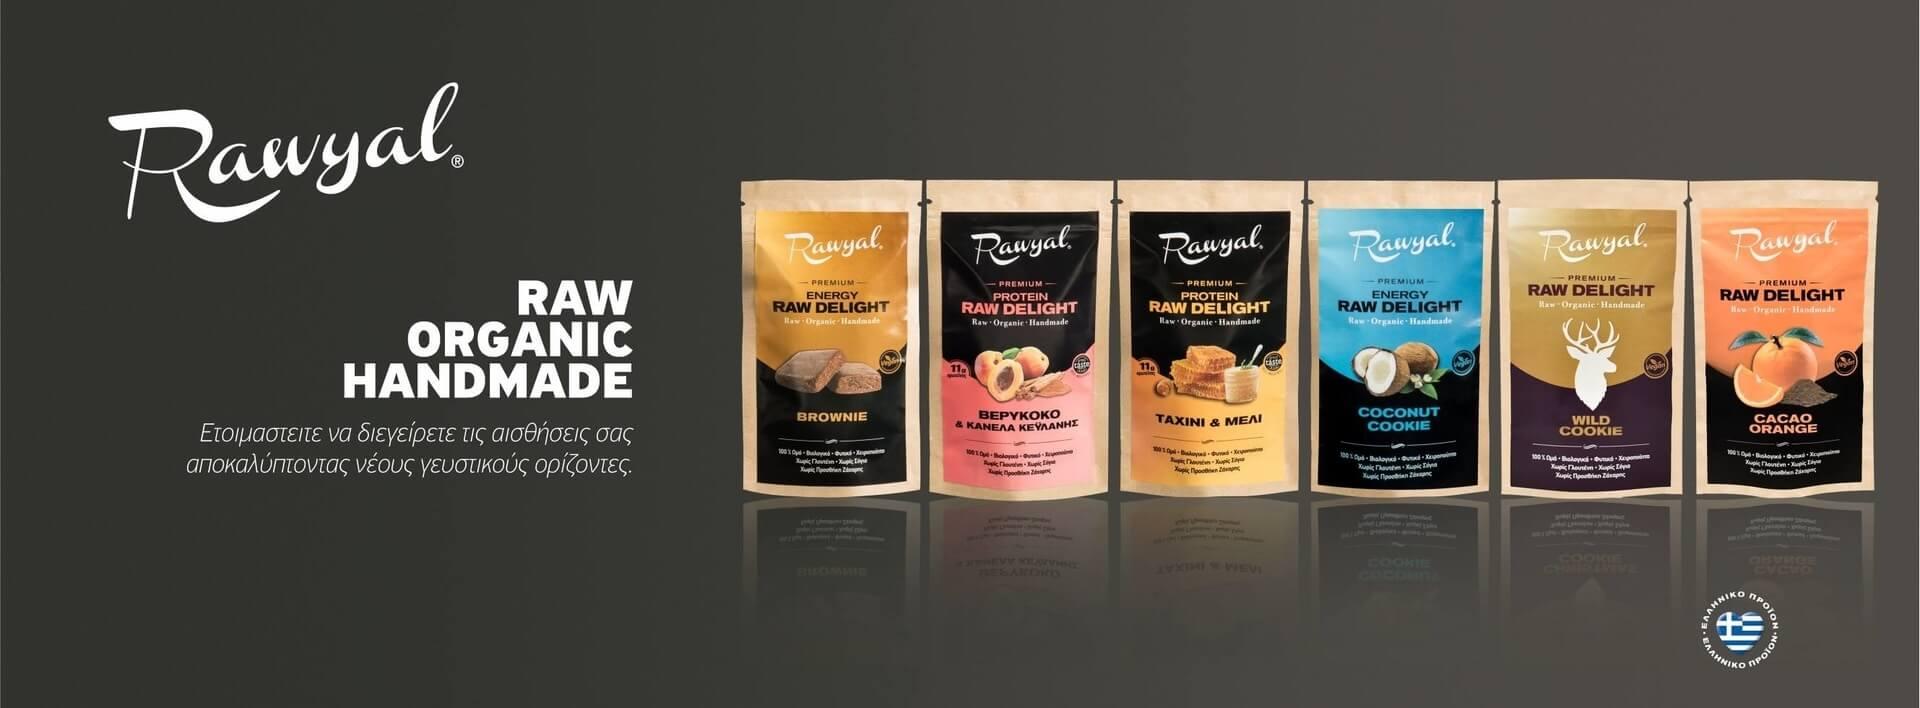 Raw Vegan Organic Bars Products Rawyal Premium Snacks Greece